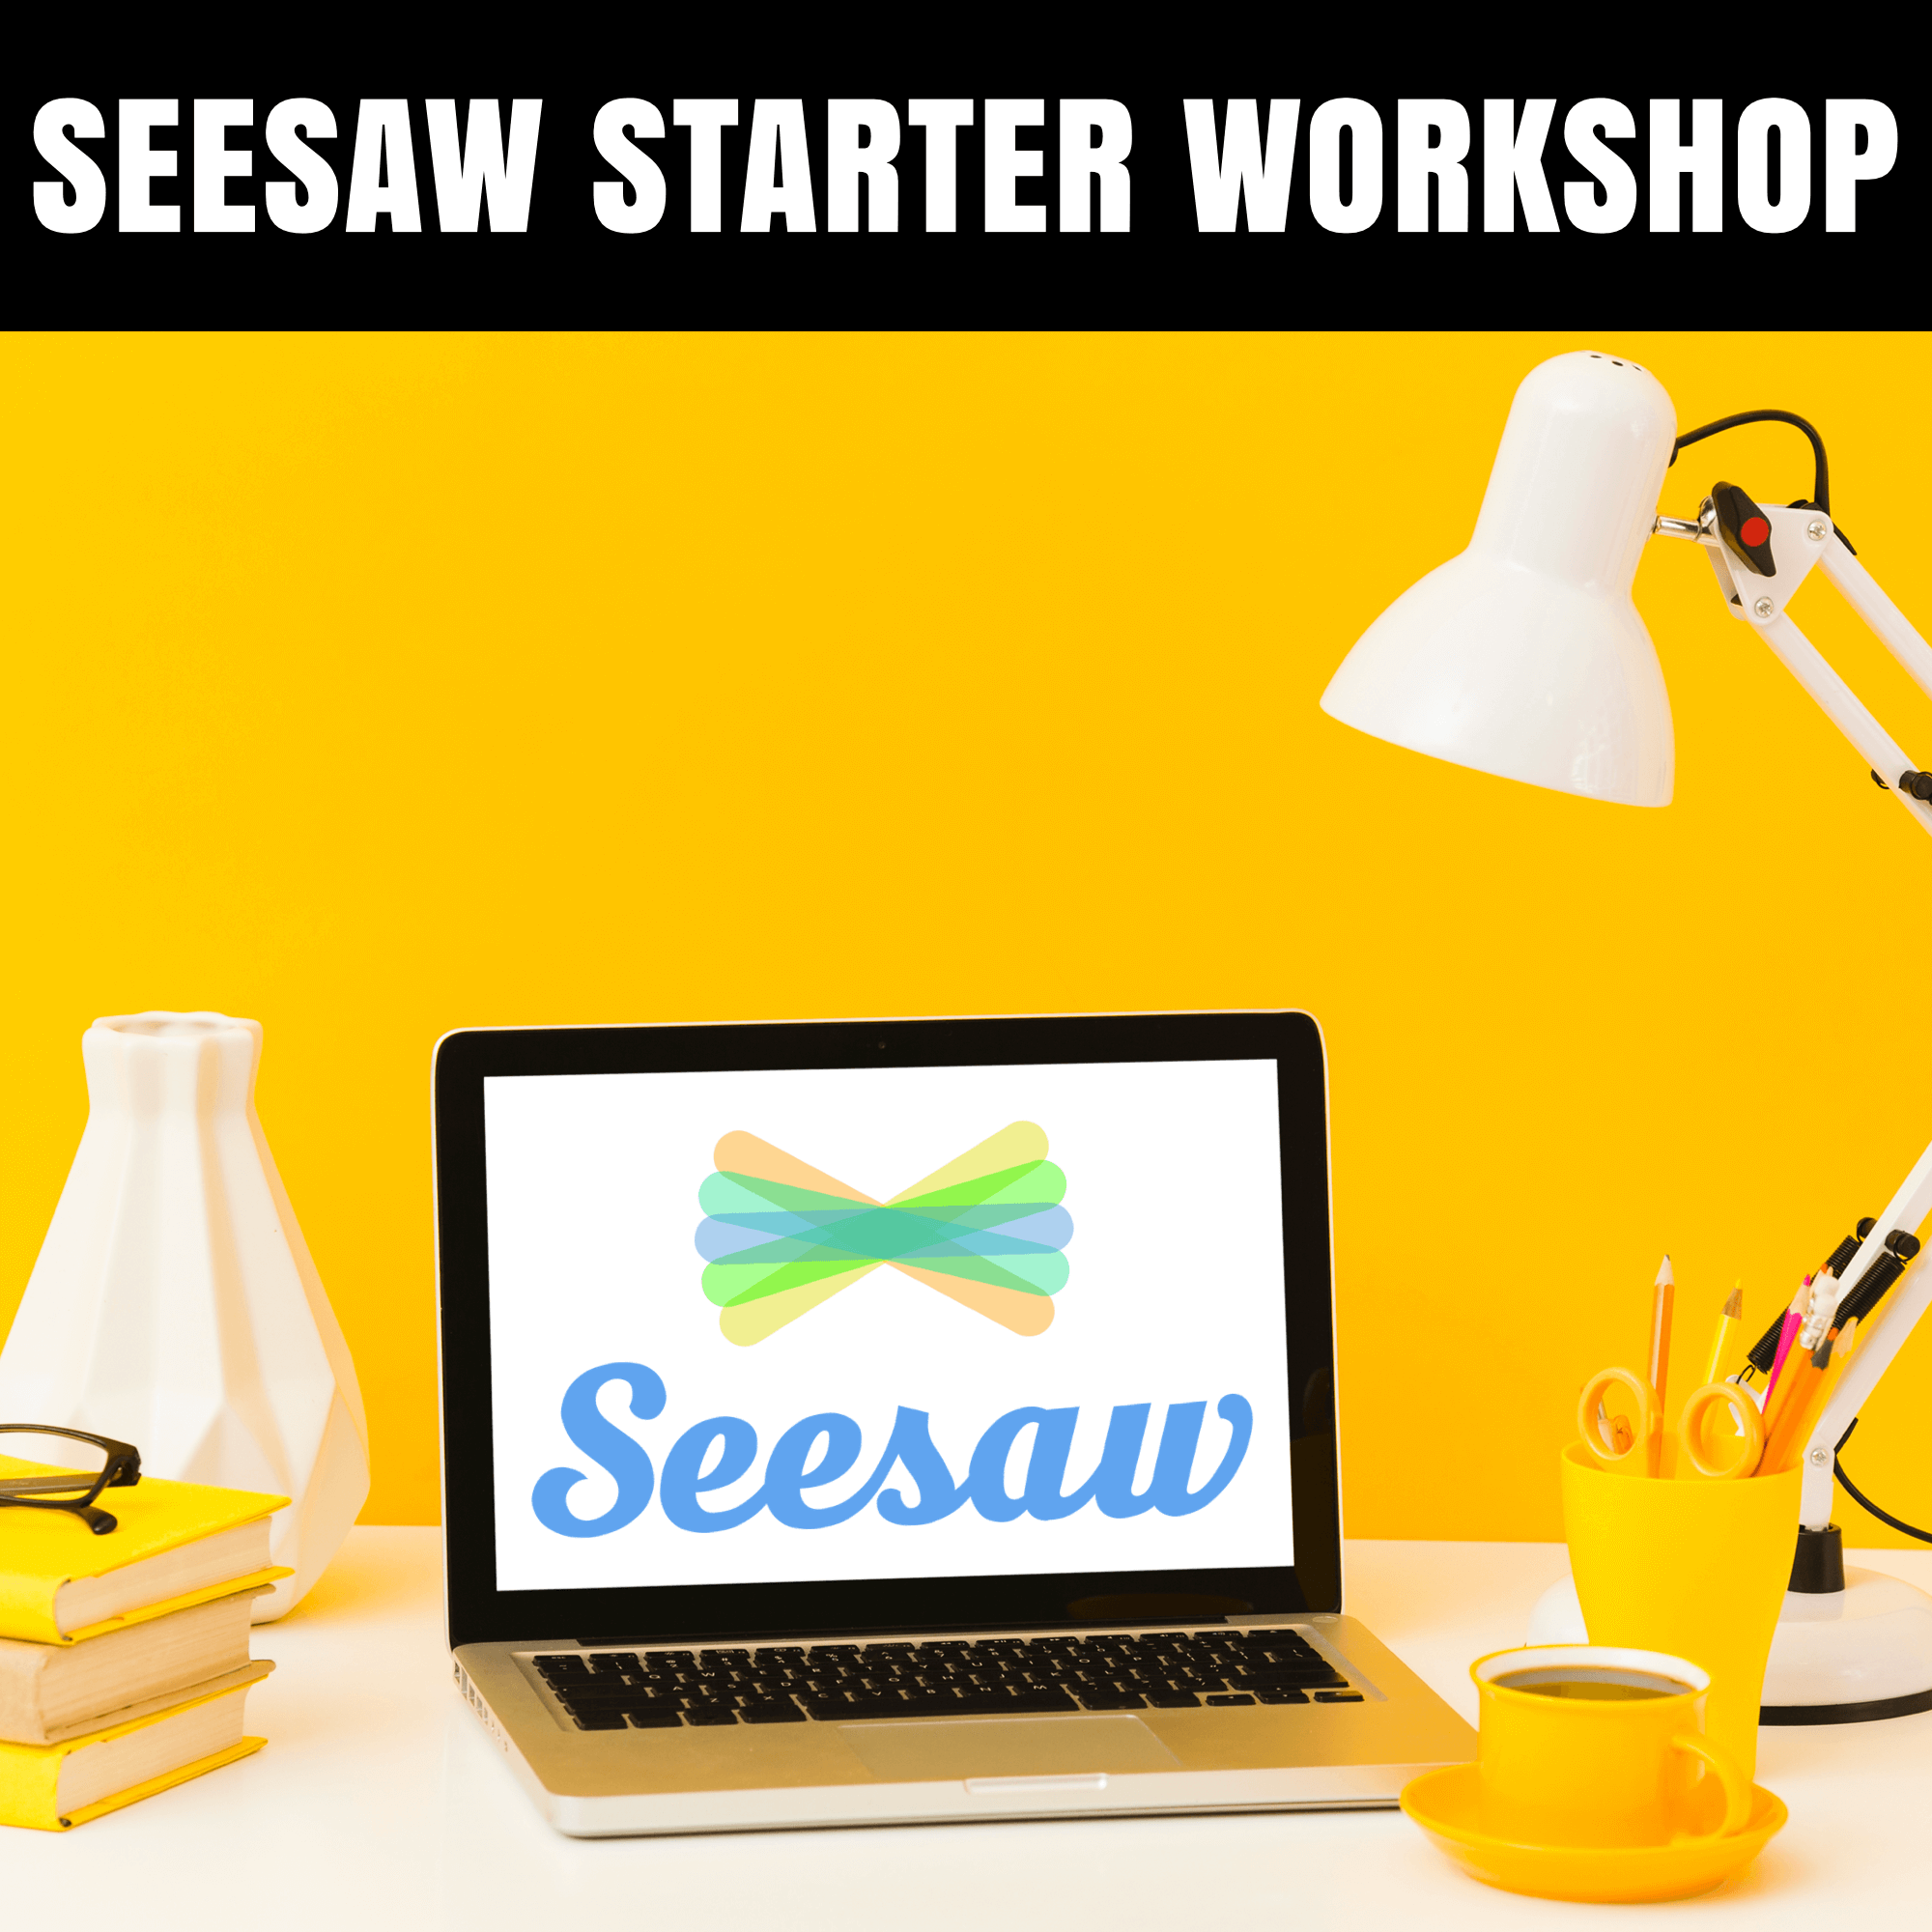 Join Seesaw Starter Workshop